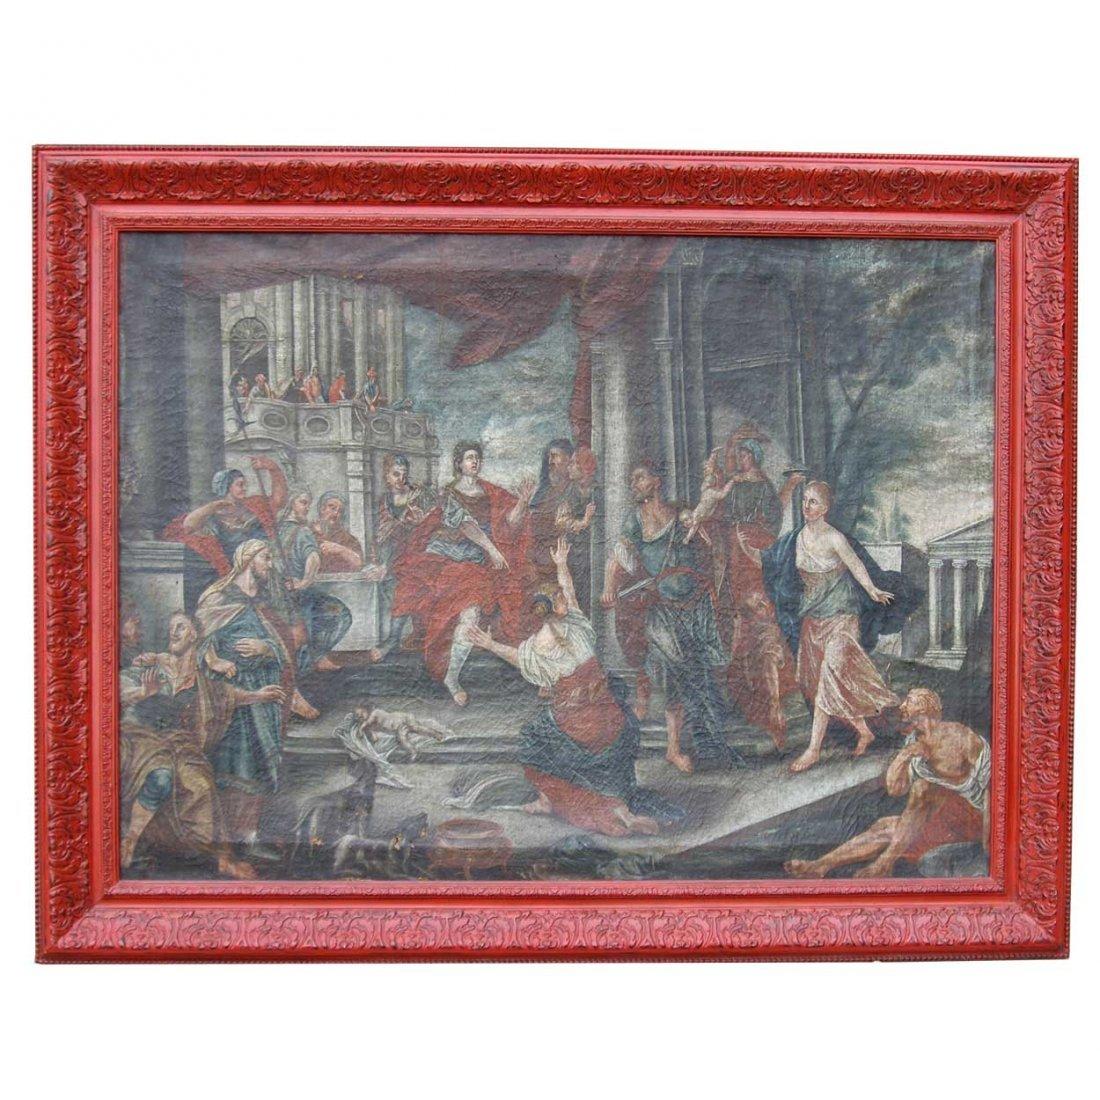 579: Italian School, (18th century), Judgment of Solomo